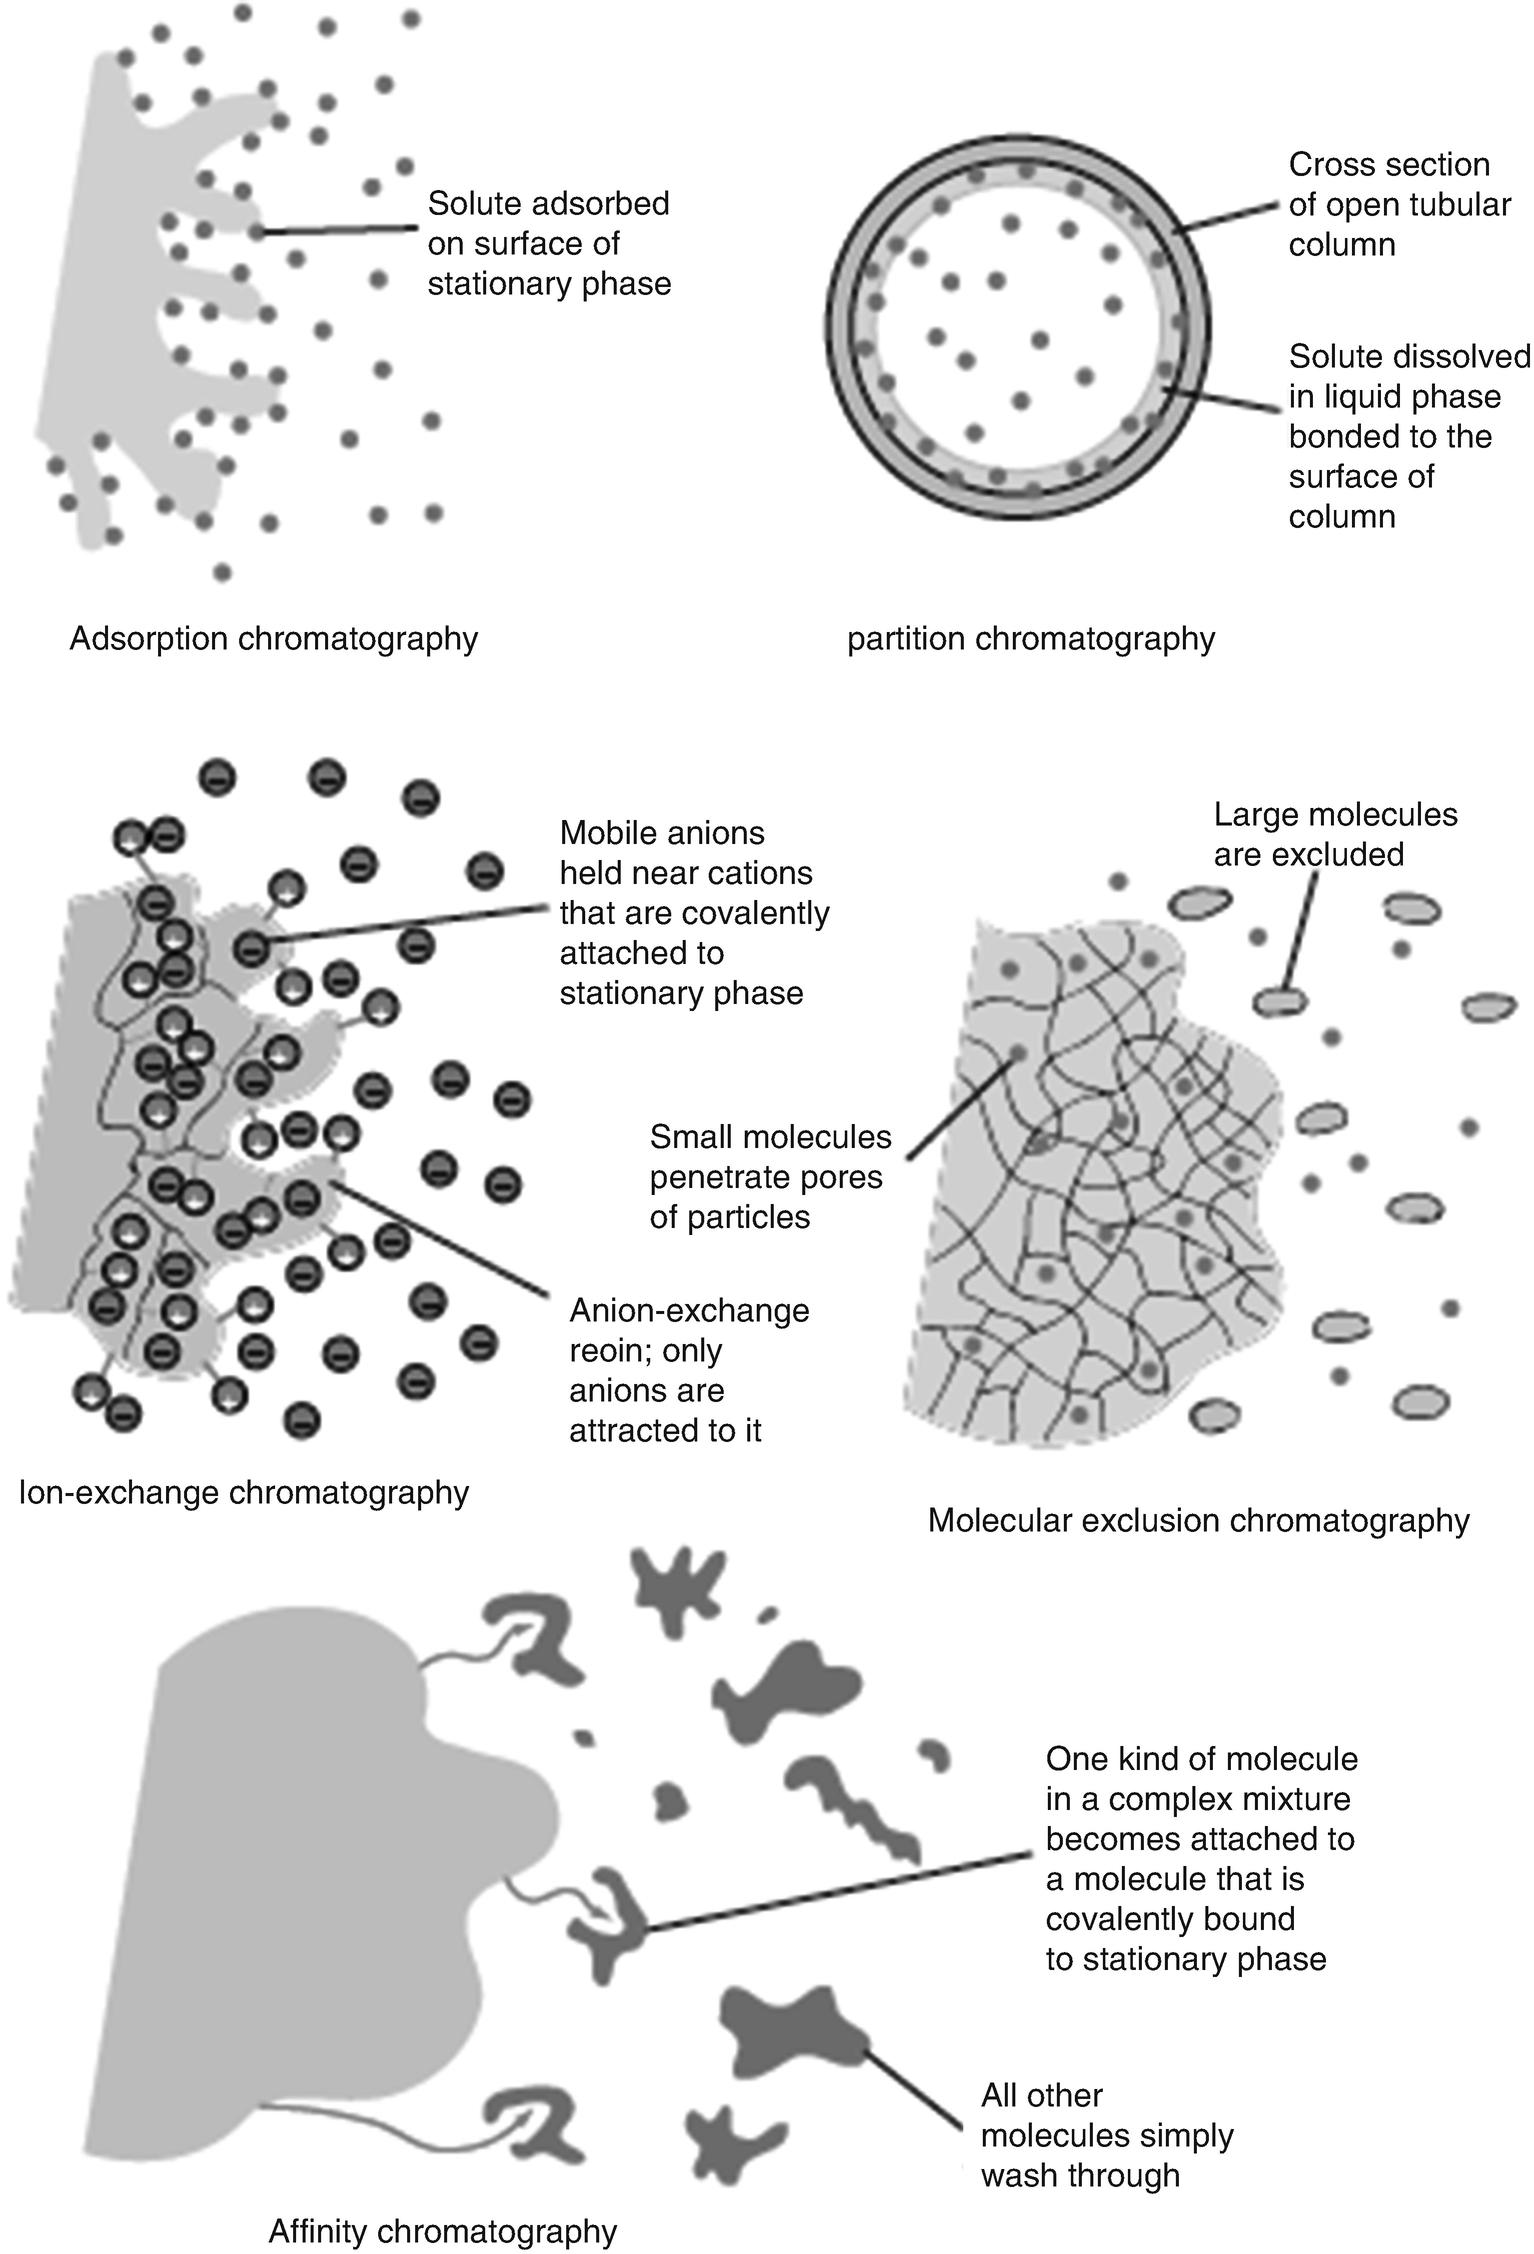 Basic Principles of Chromatography | SpringerLink